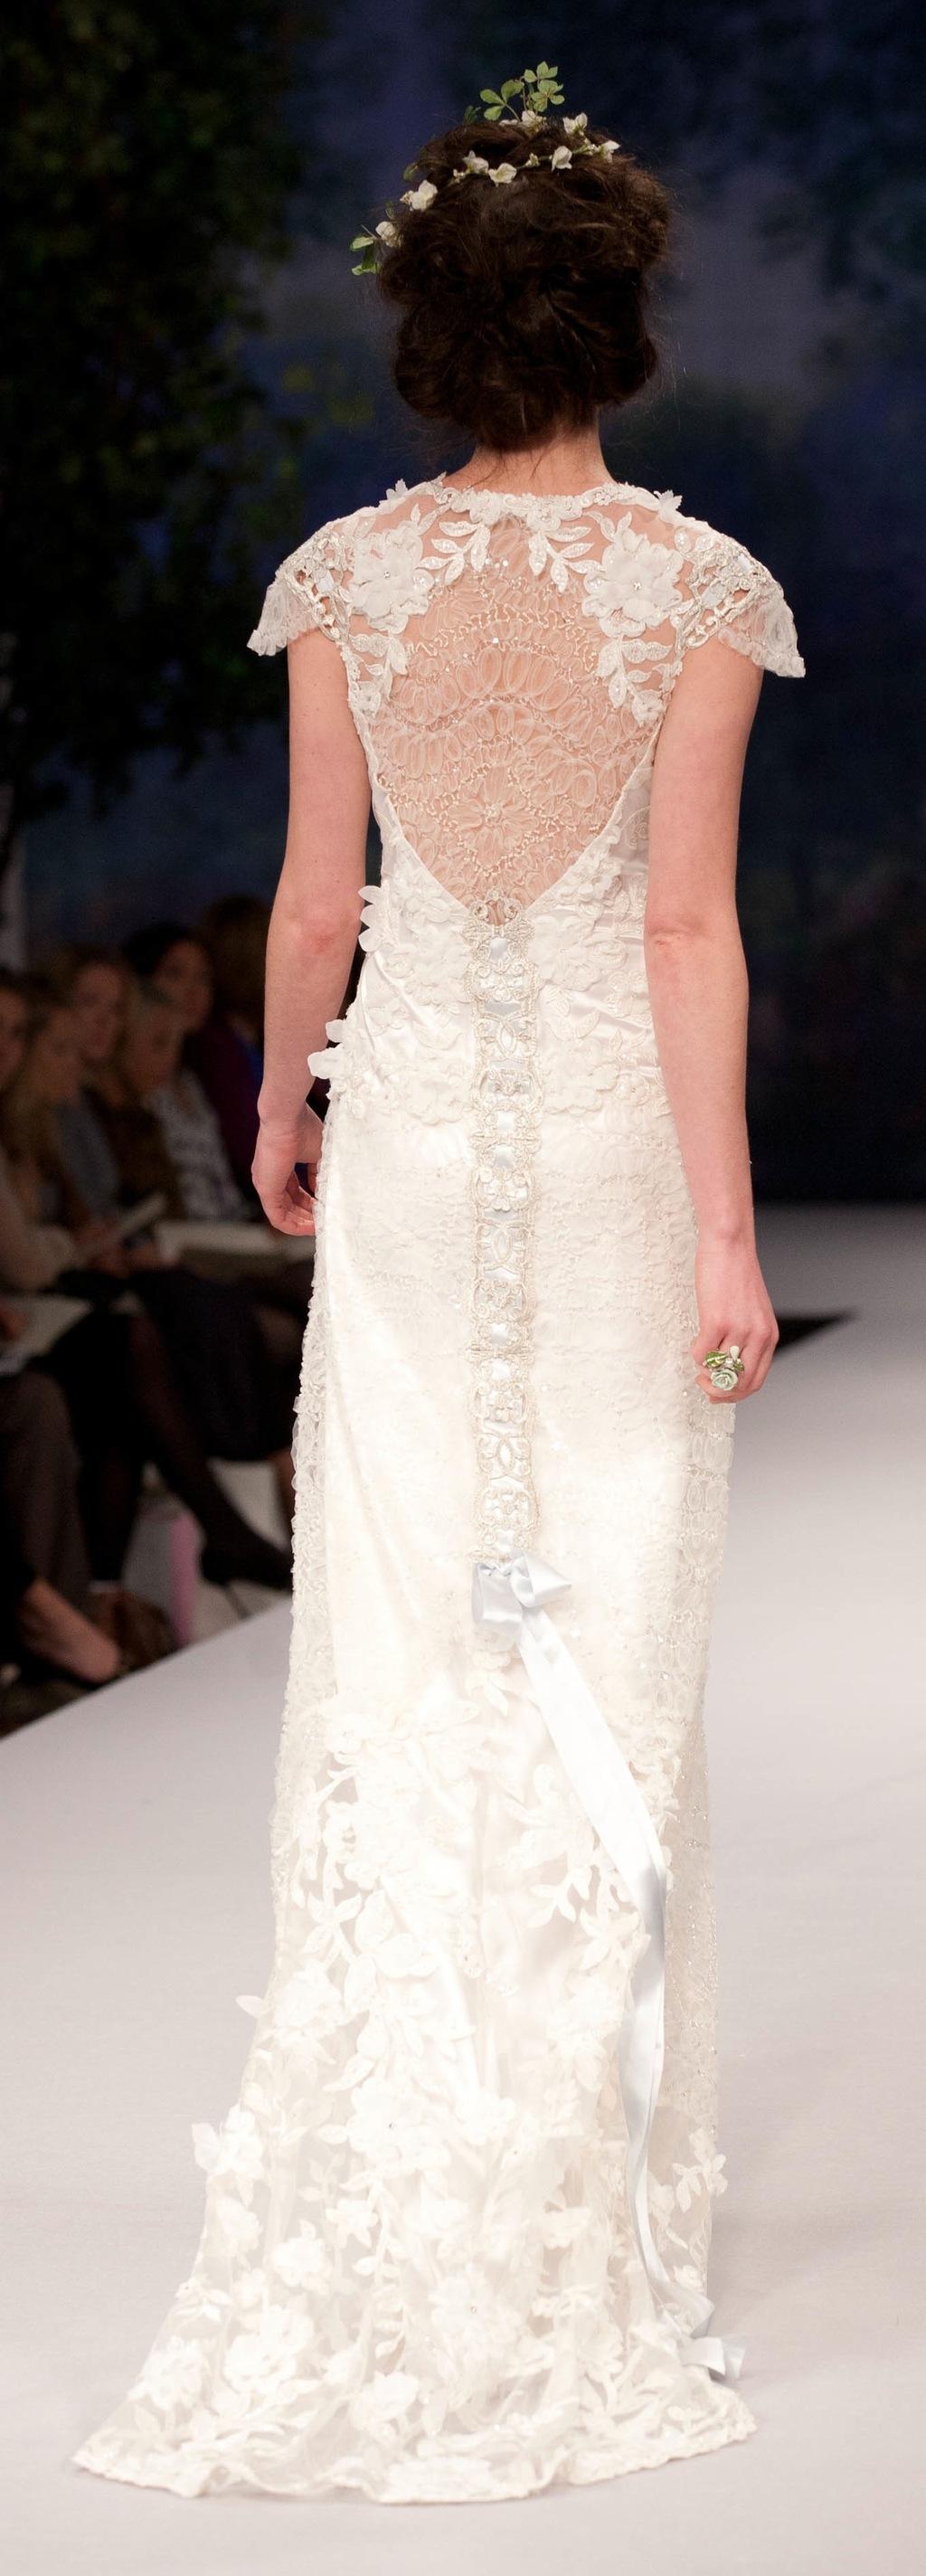 Spring_2012_wedding_dress_claire_pettibone_belle_back.full